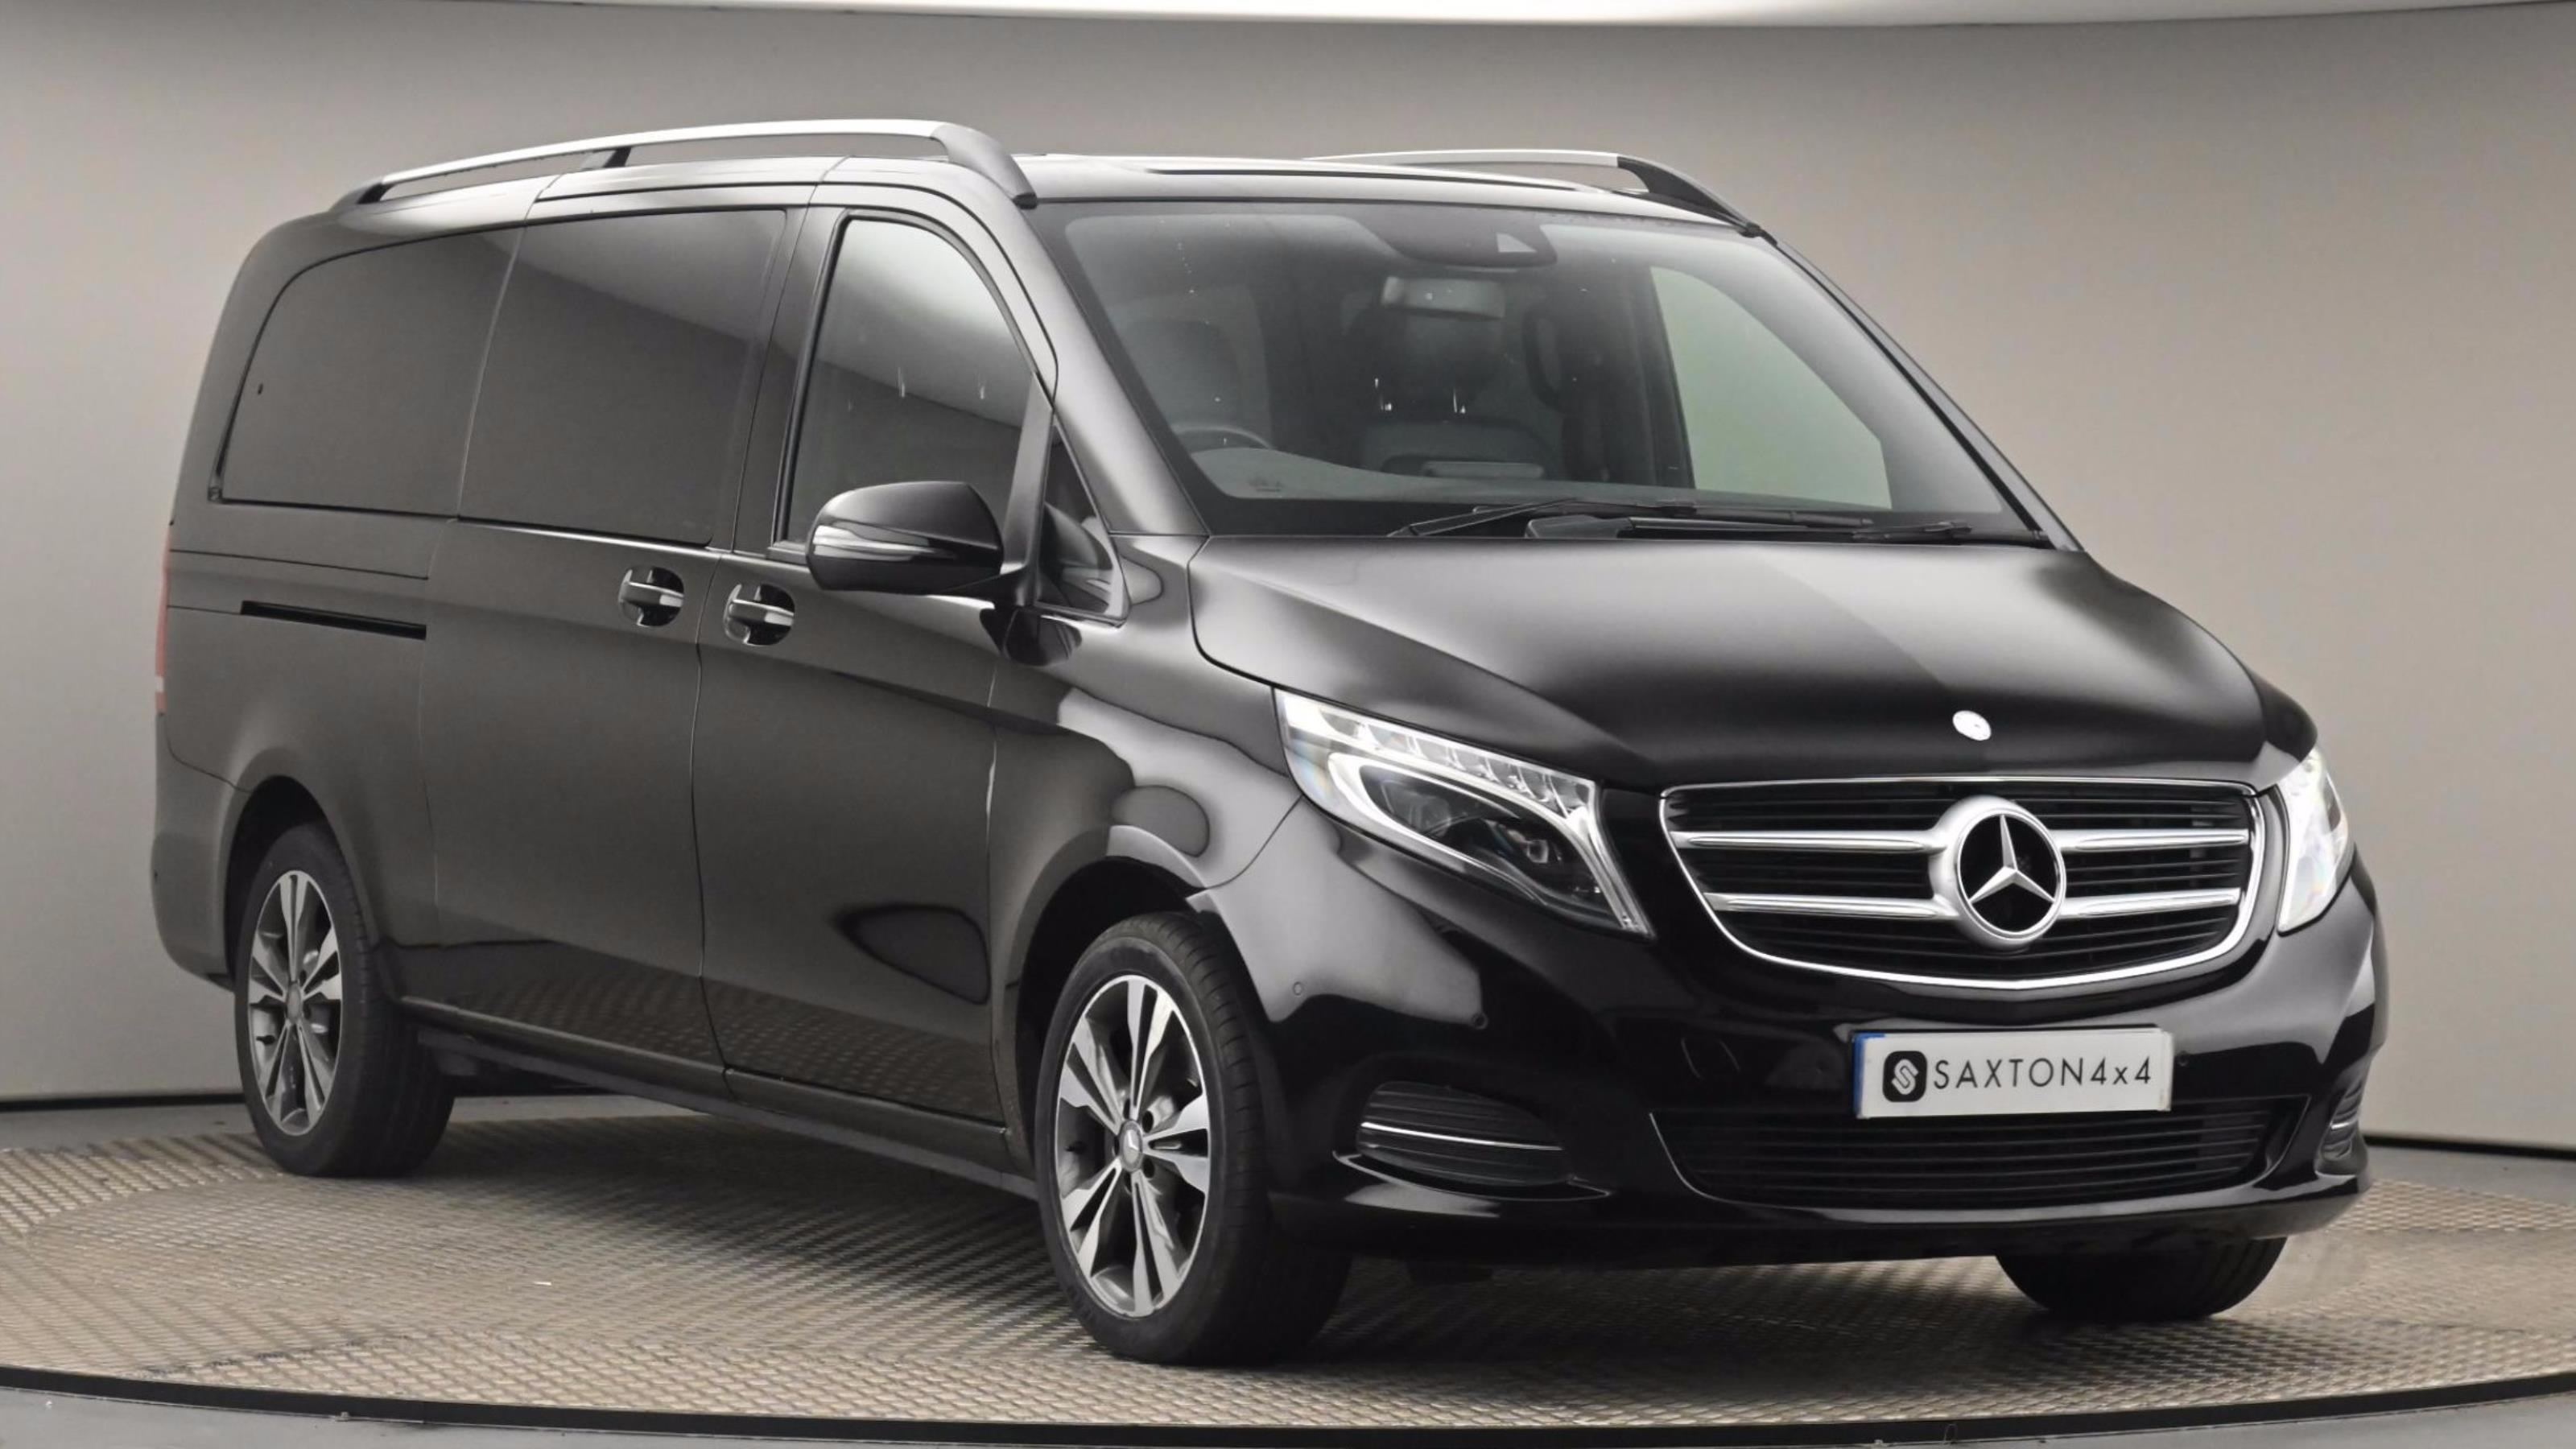 Used 2017 Mercedes-Benz V CLASS V220 BlueTEC Sport 5dr Auto [Extra Long] at Saxton4x4